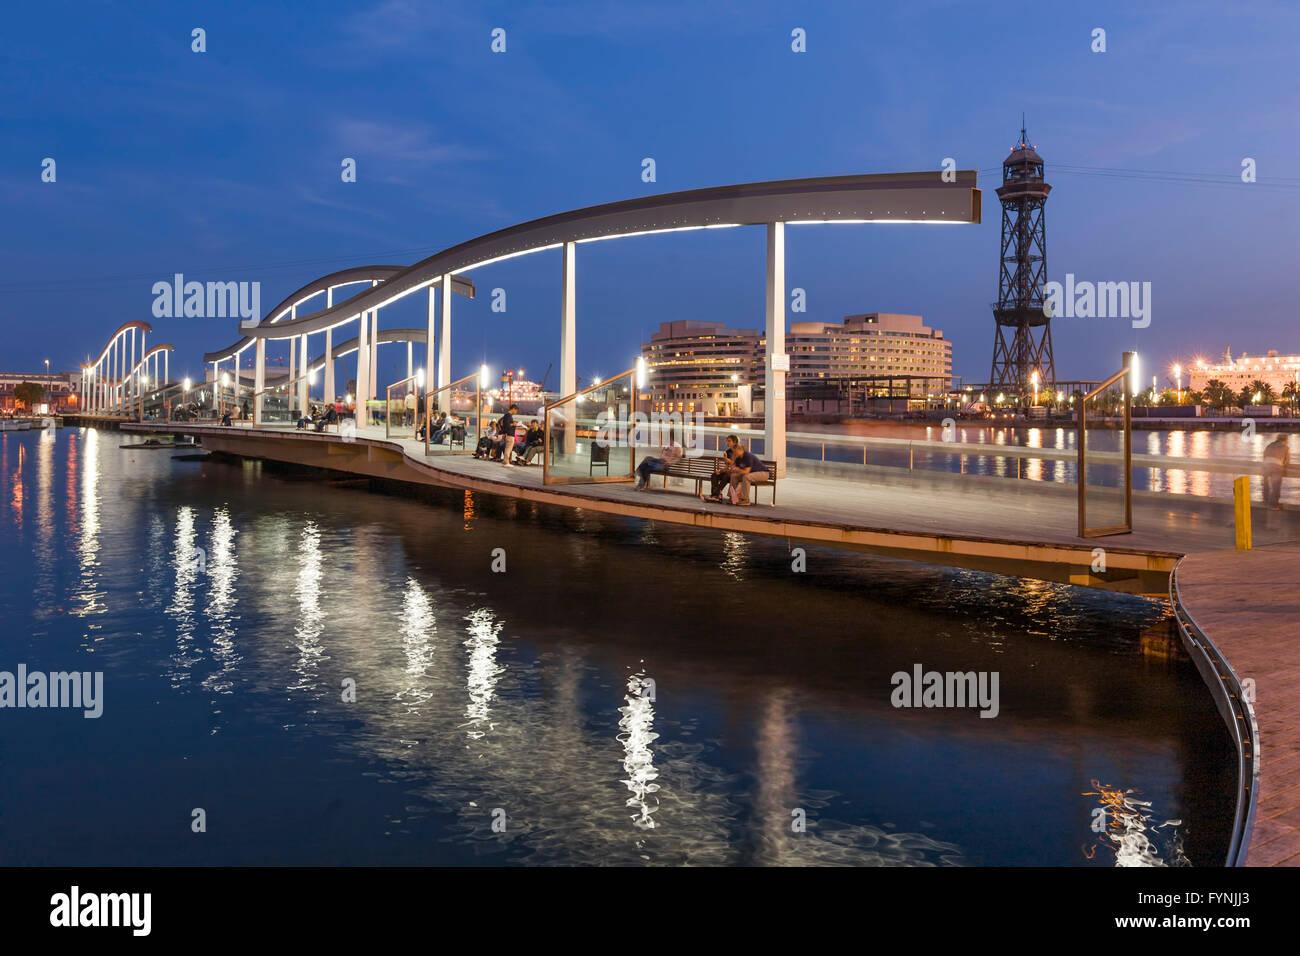 Footbridge, Rambla de Mar, Twilight, Port Vell, Barcelona, Catalunya, Spain - Stock Image